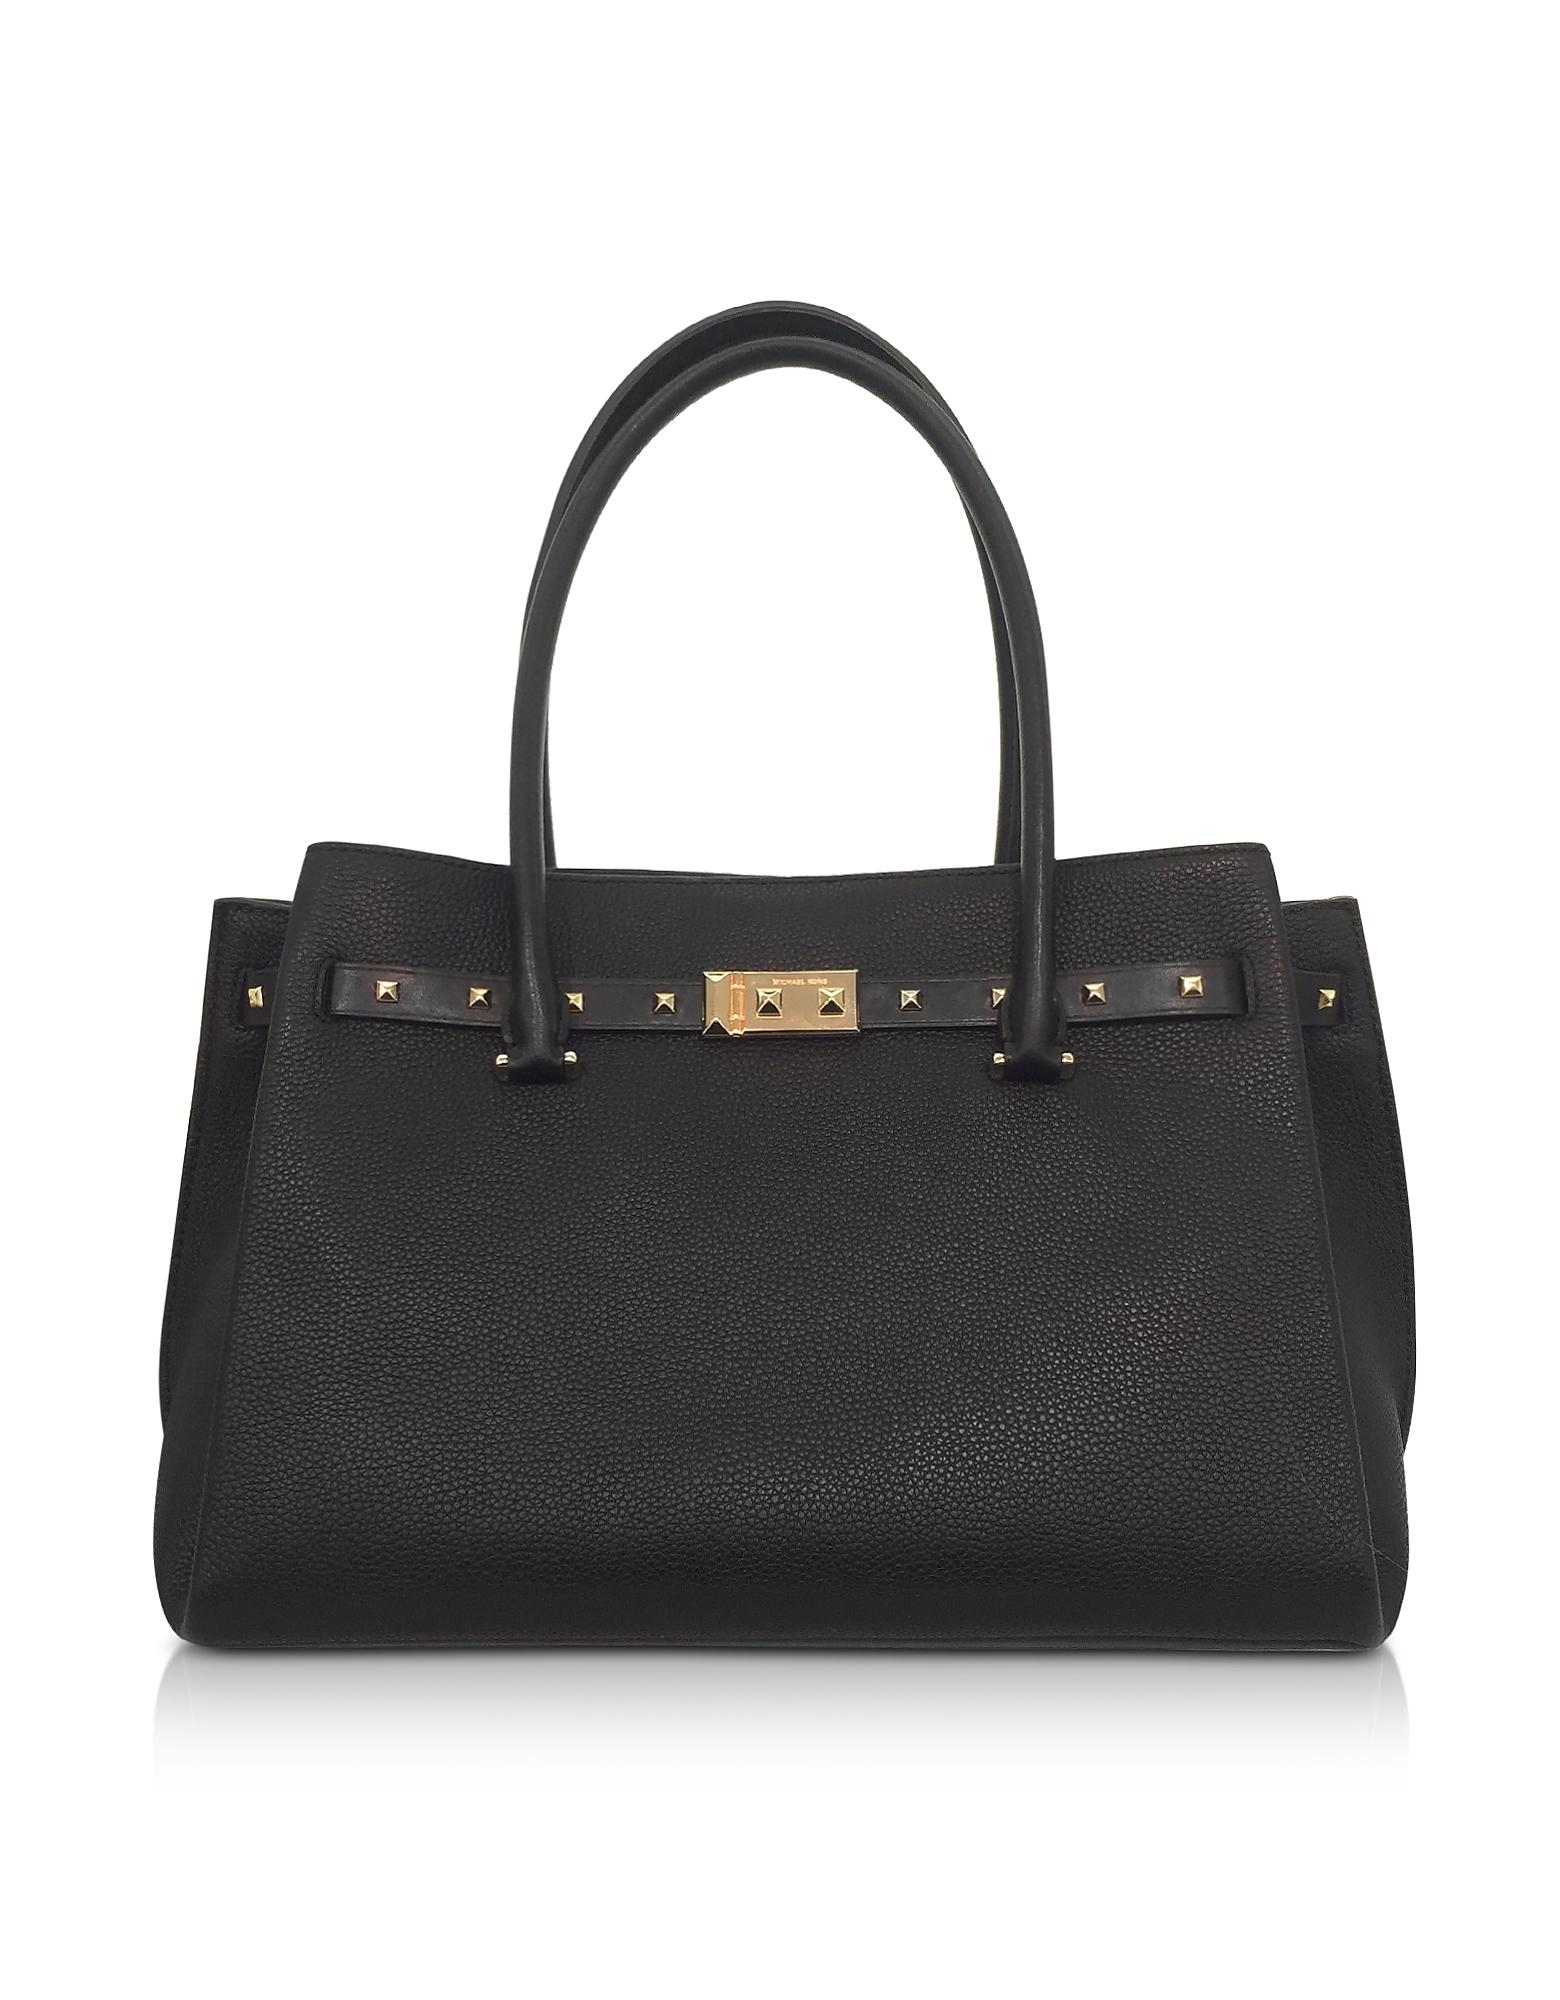 7db99cad1e03 Michael Kors Black Pebbled Leather Large Addison Tote Bag In Black/Gold